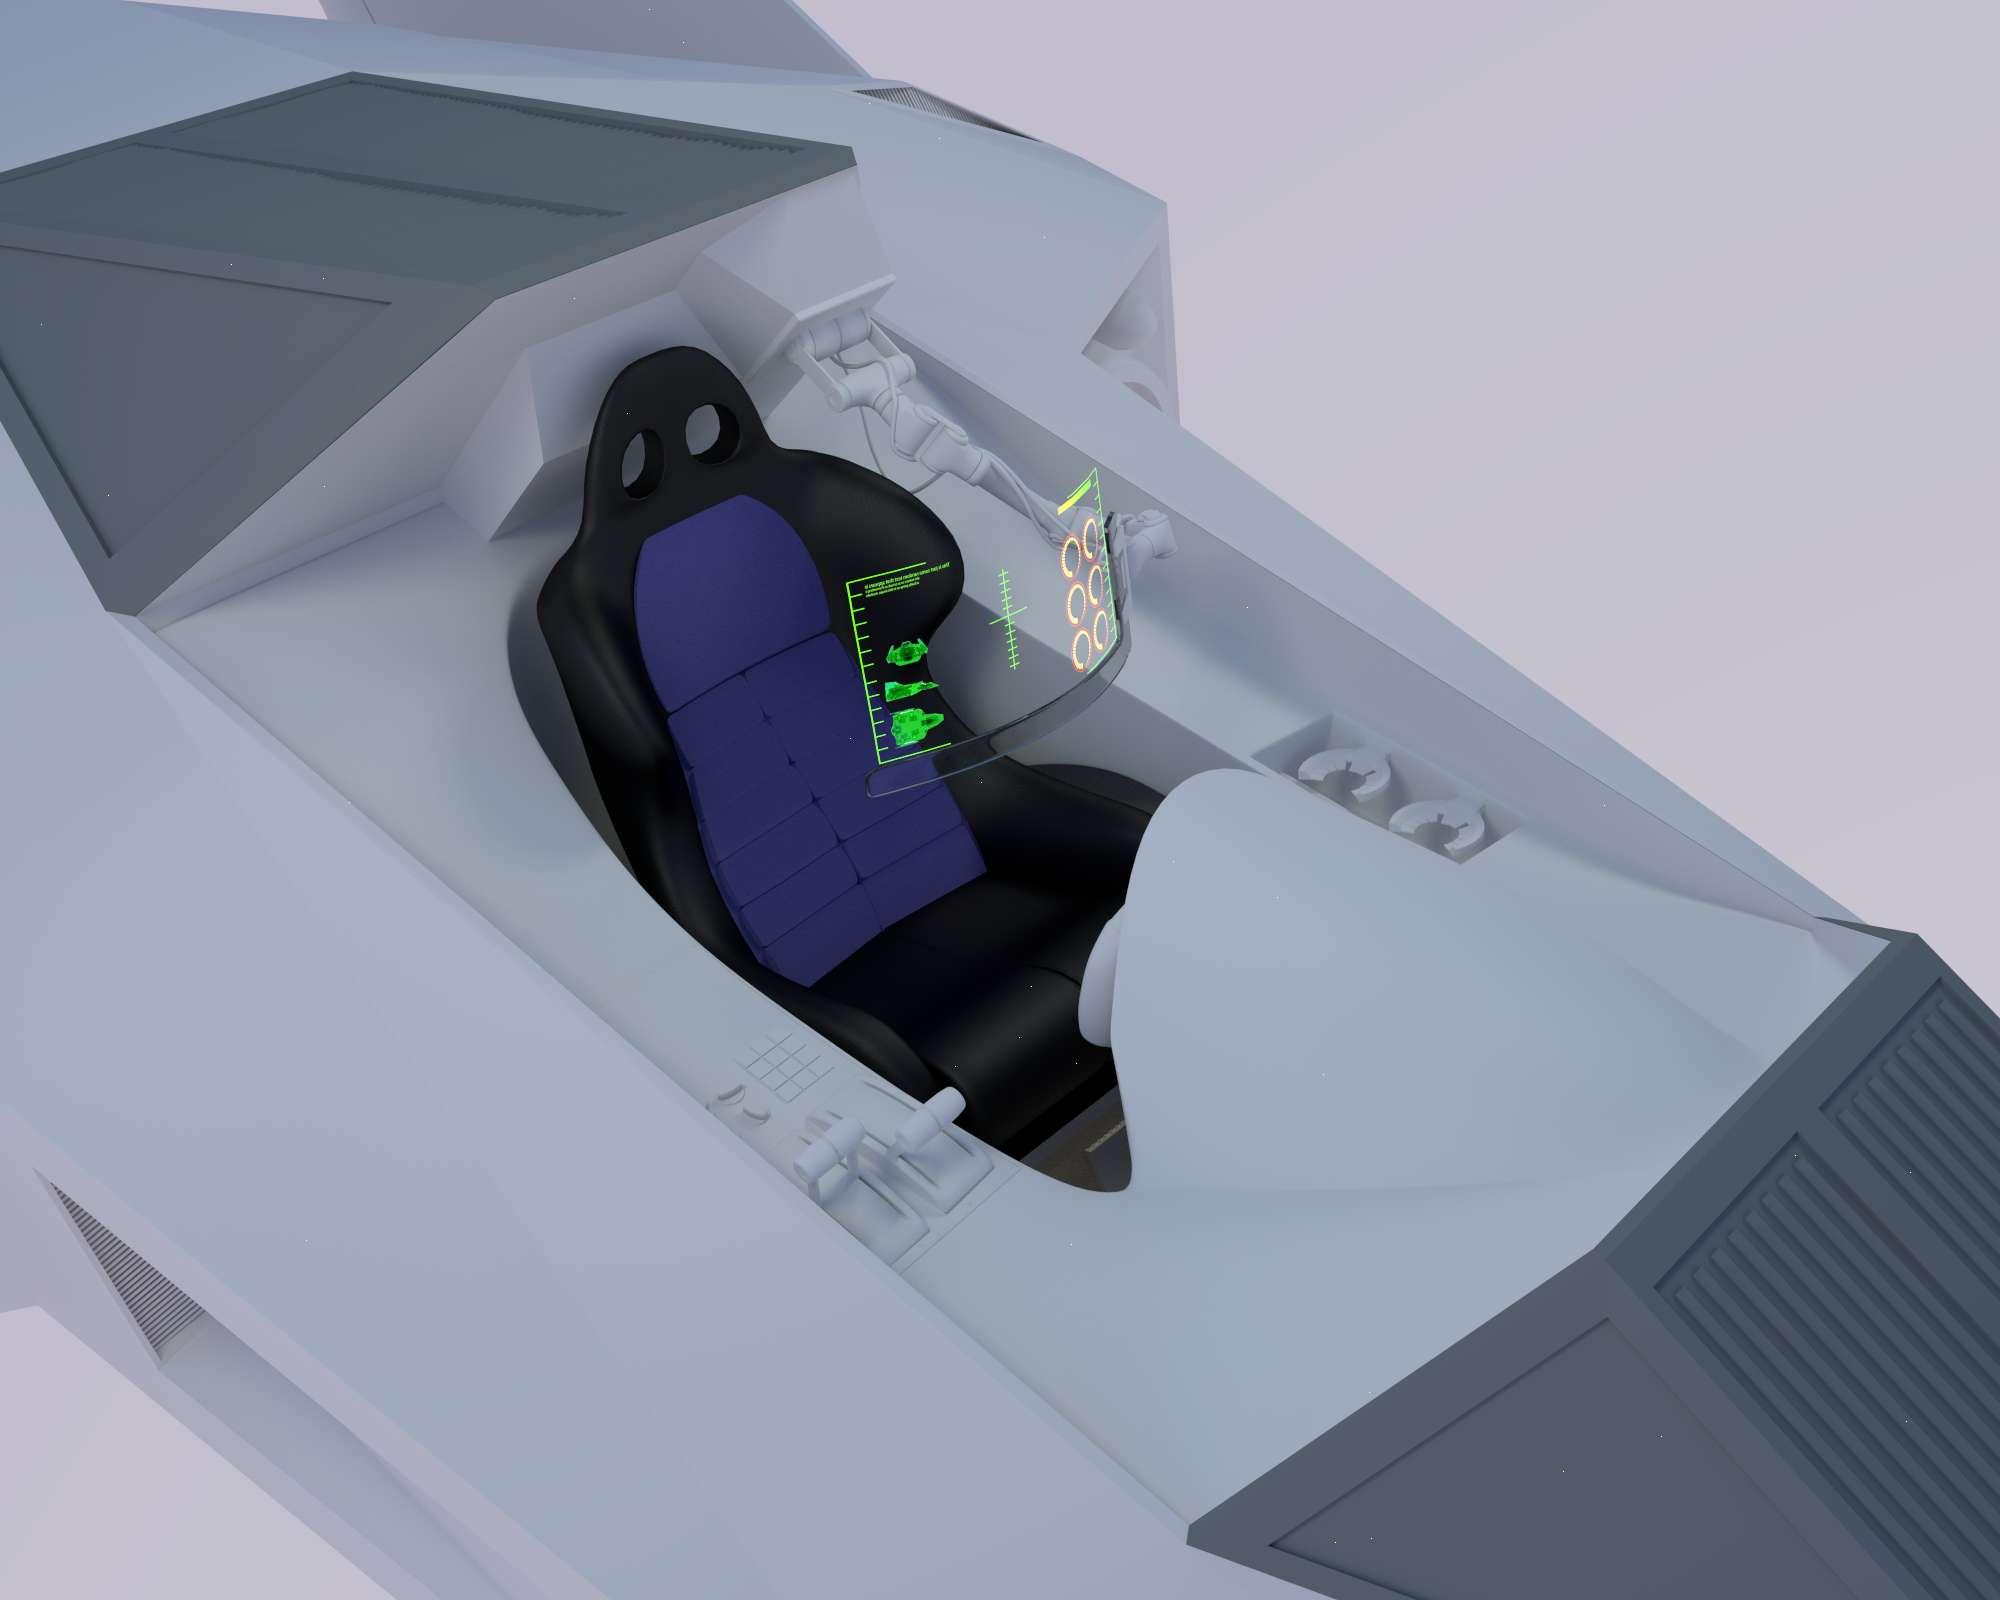 http://img46.imageshack.us/img46/6779/cockpitseattextured4.png